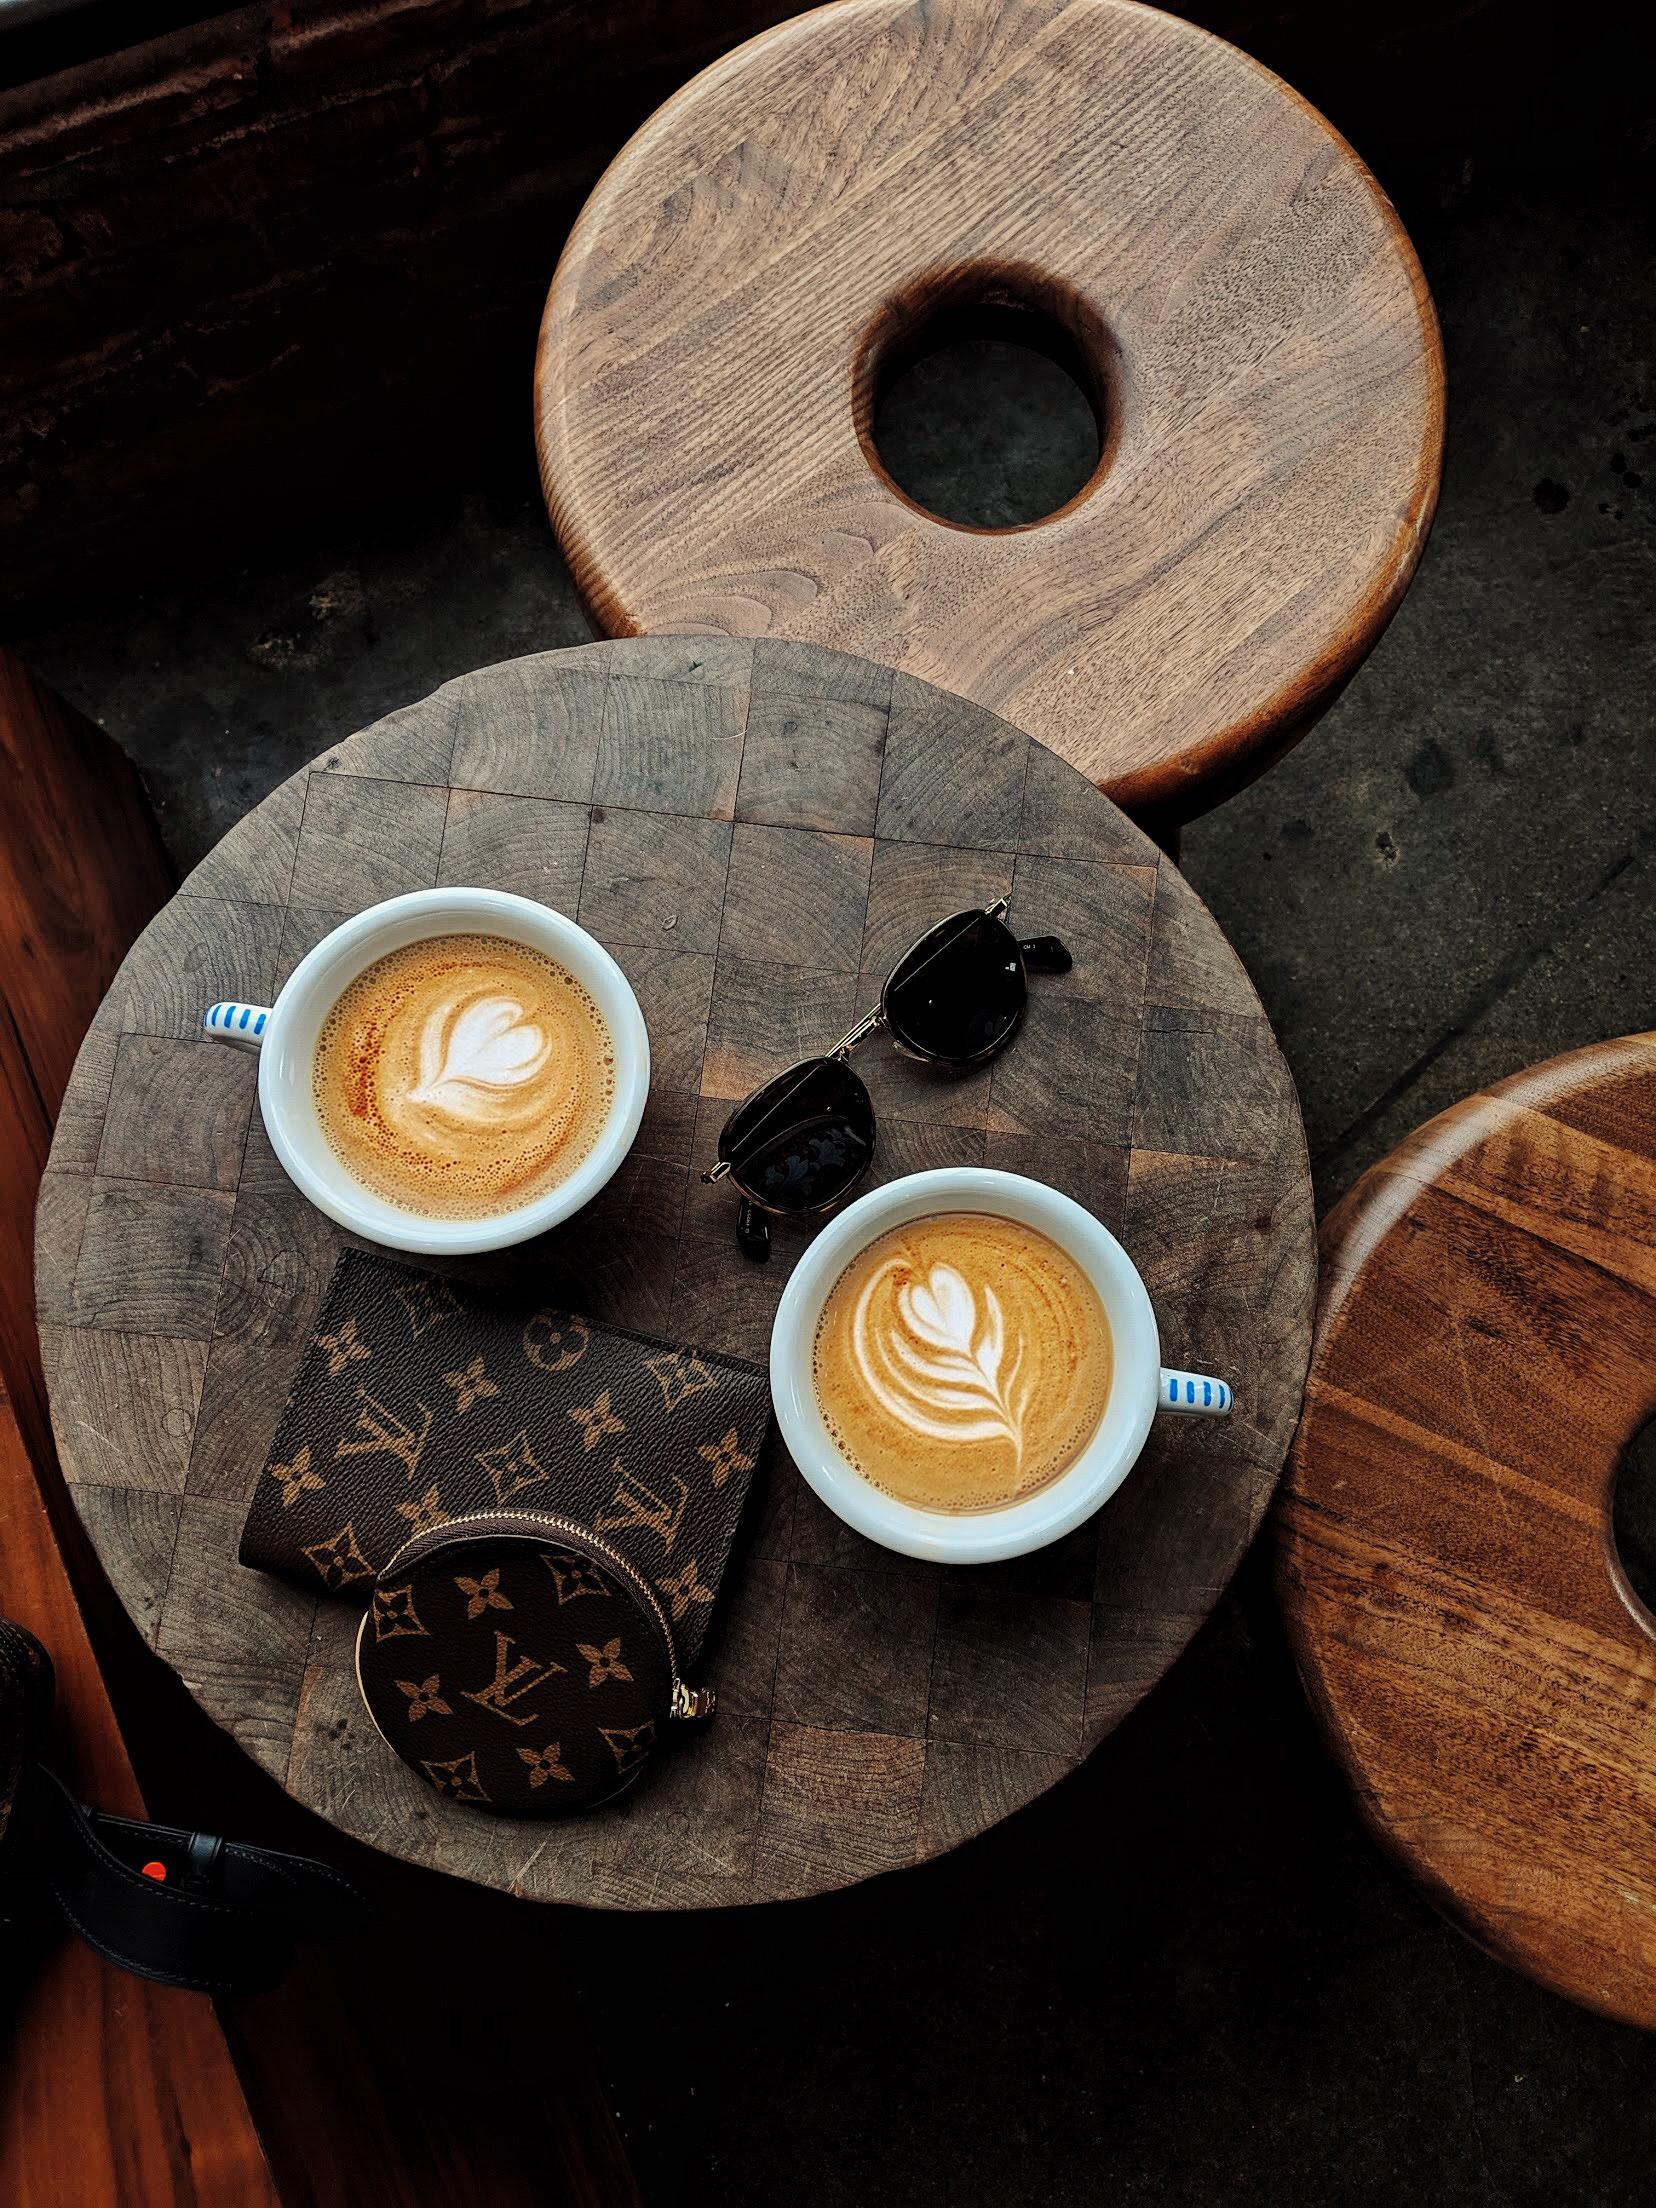 la Colombe coffee shop